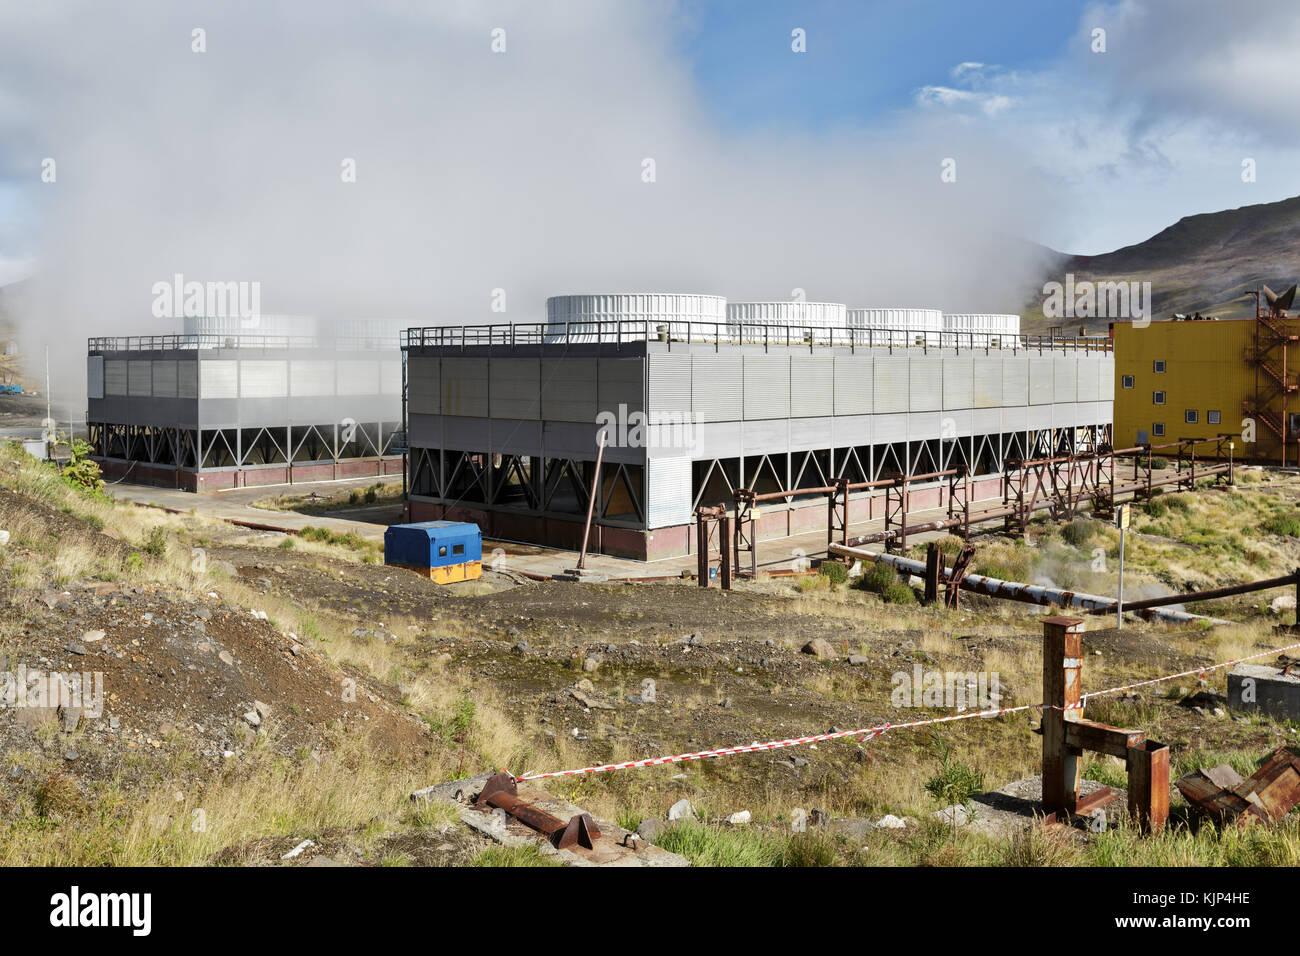 Kamchatka Peninsula, fan cooling towers of Mutnovskaya Geothermal Power Station (Mutnovskaya GeoPP-1) using geothermal - Stock Image